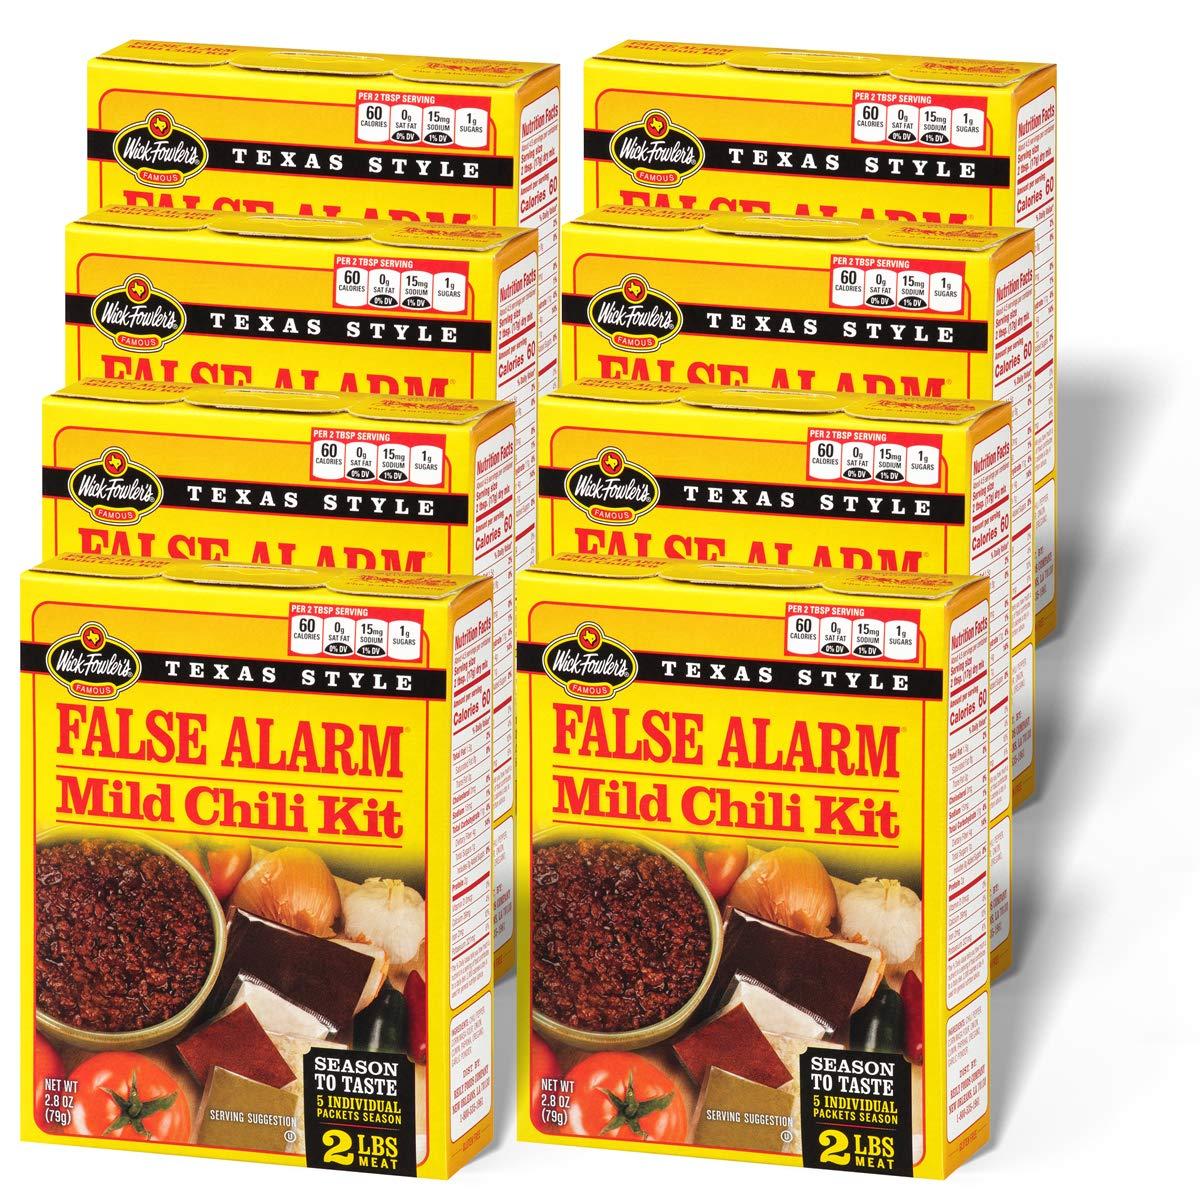 Amazon Com Wick Fowler S False Alarm Mild Chili Mix Kit 2 8 Ounces Pack Of 8 Grocery Gourmet Food